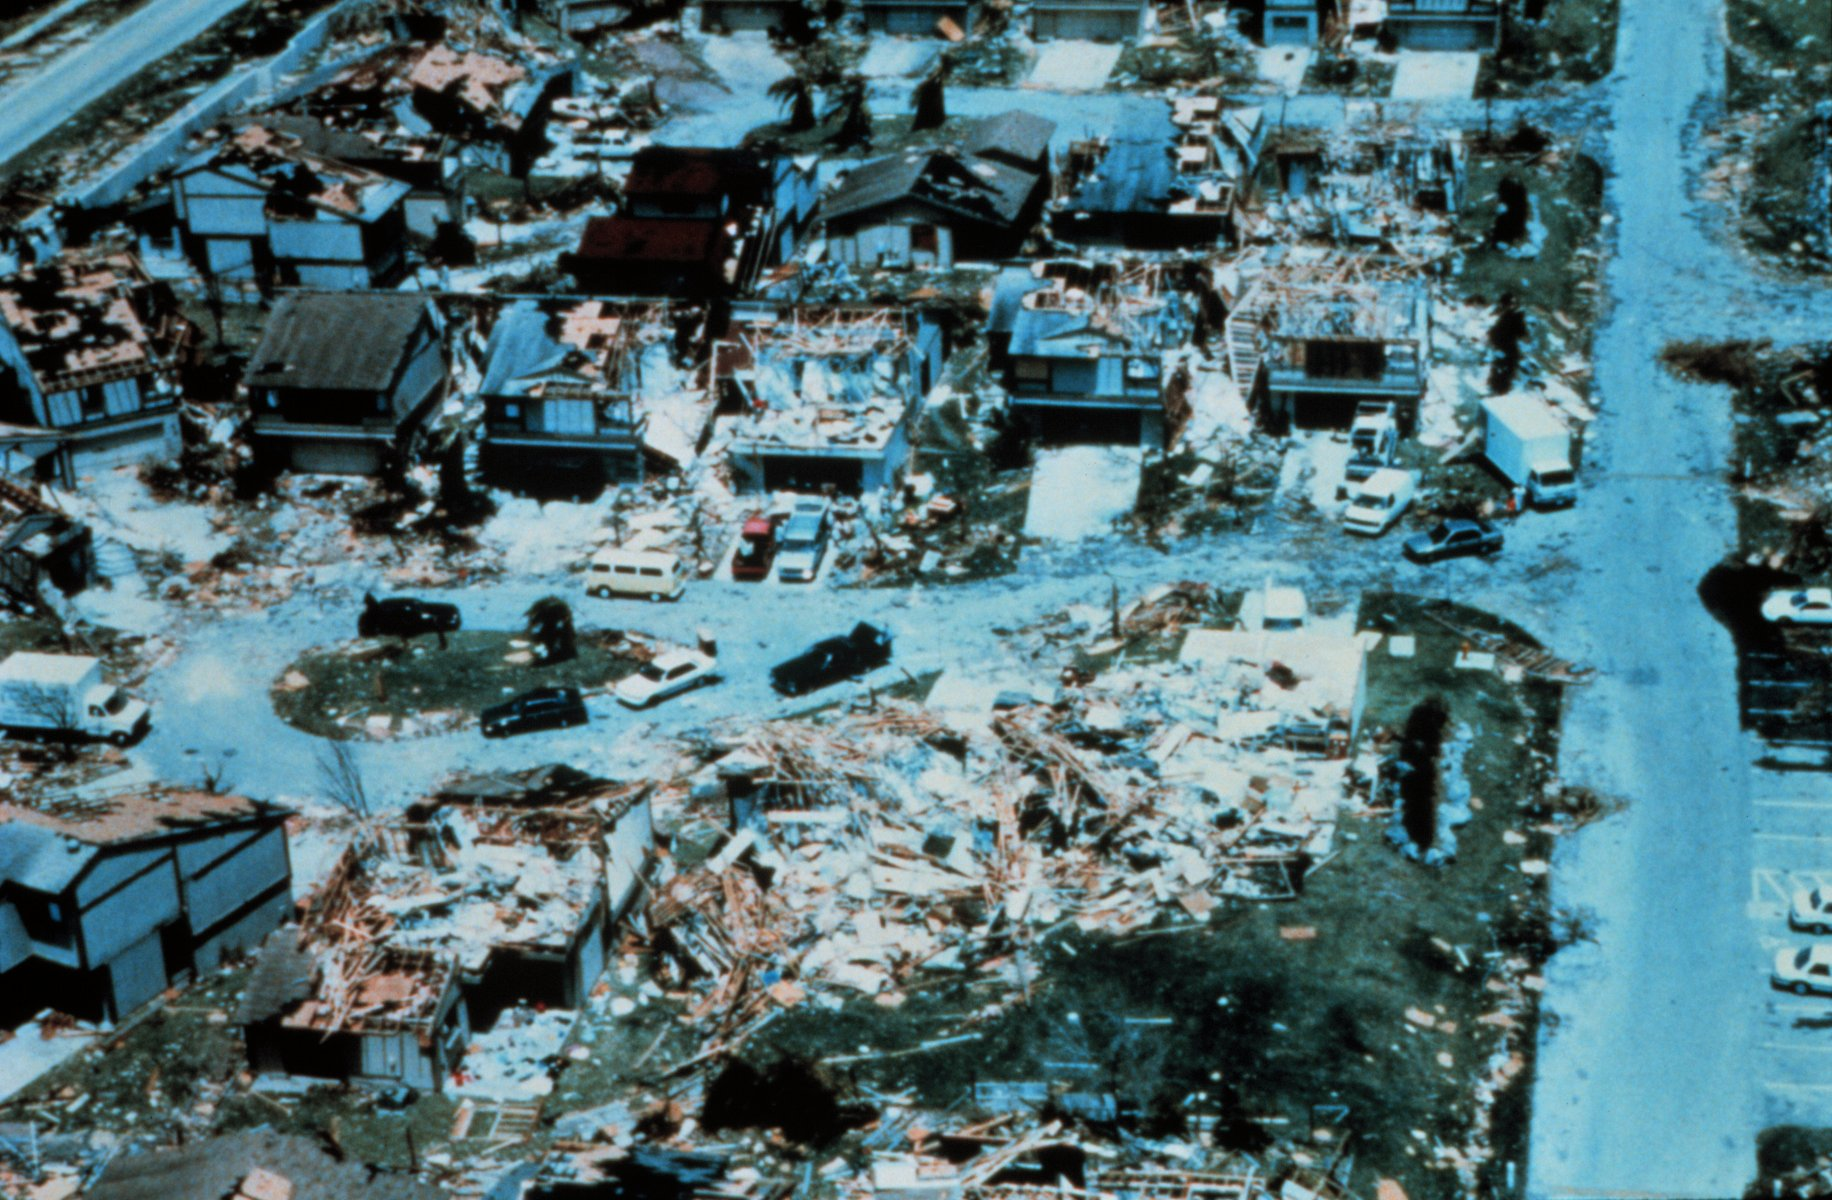 Destruction_following_hurricane_andrew.jpg